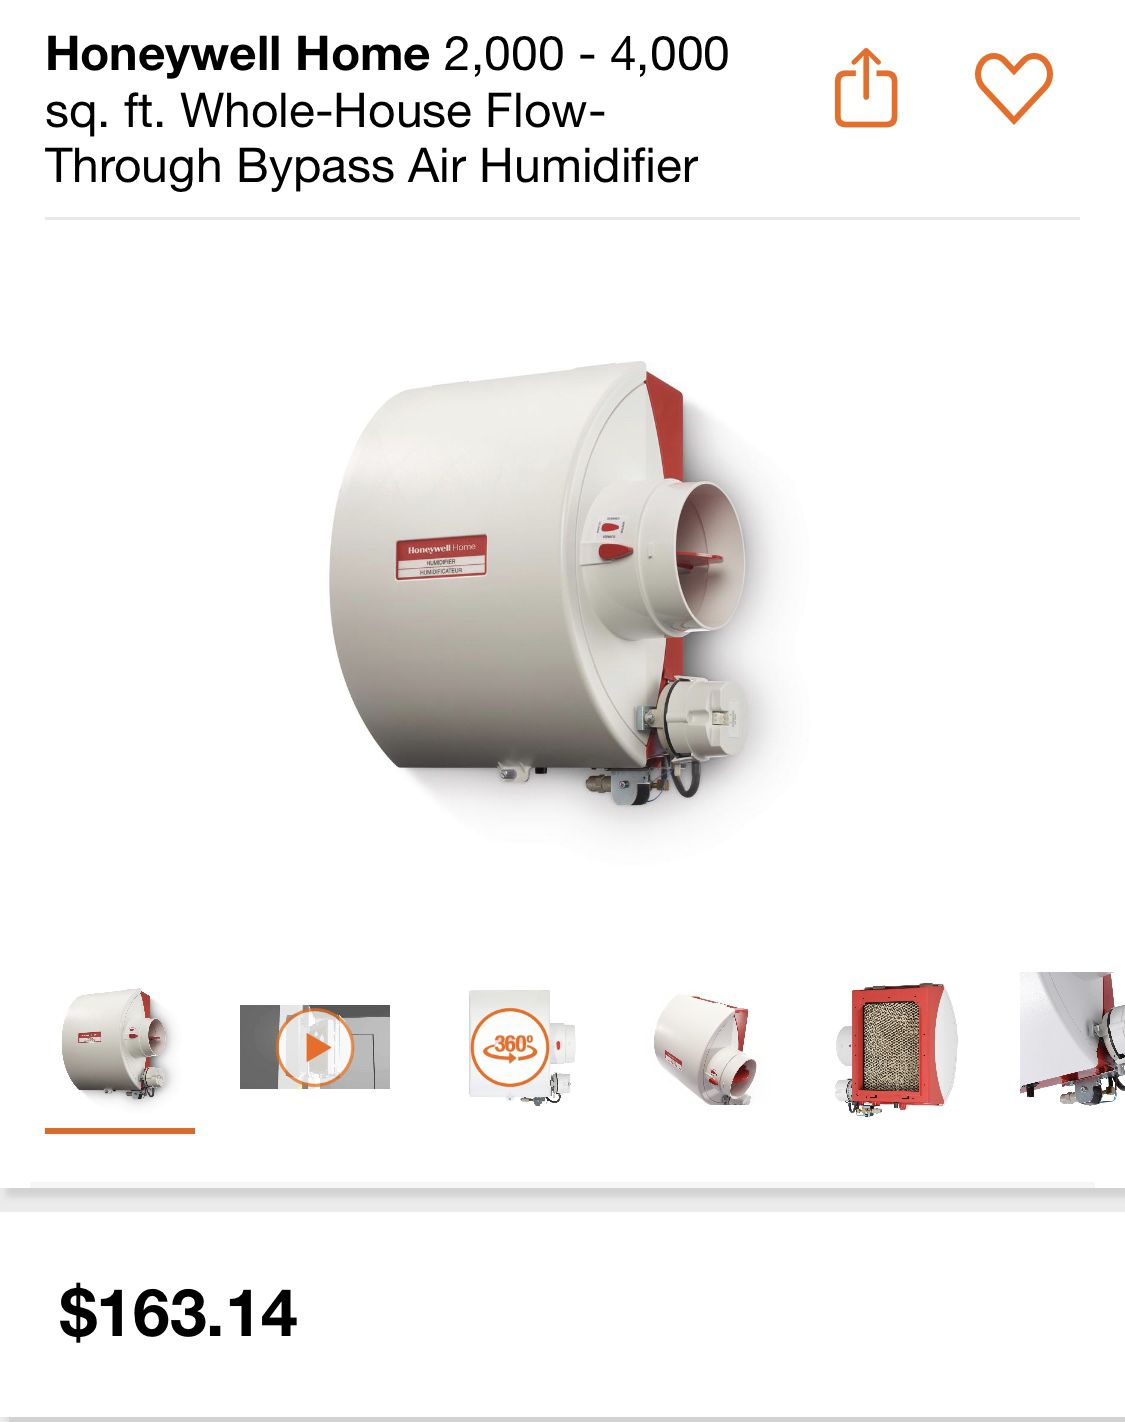 HONEYWELL 2,000-4,000 sq. ft Whole House Air Humidifier